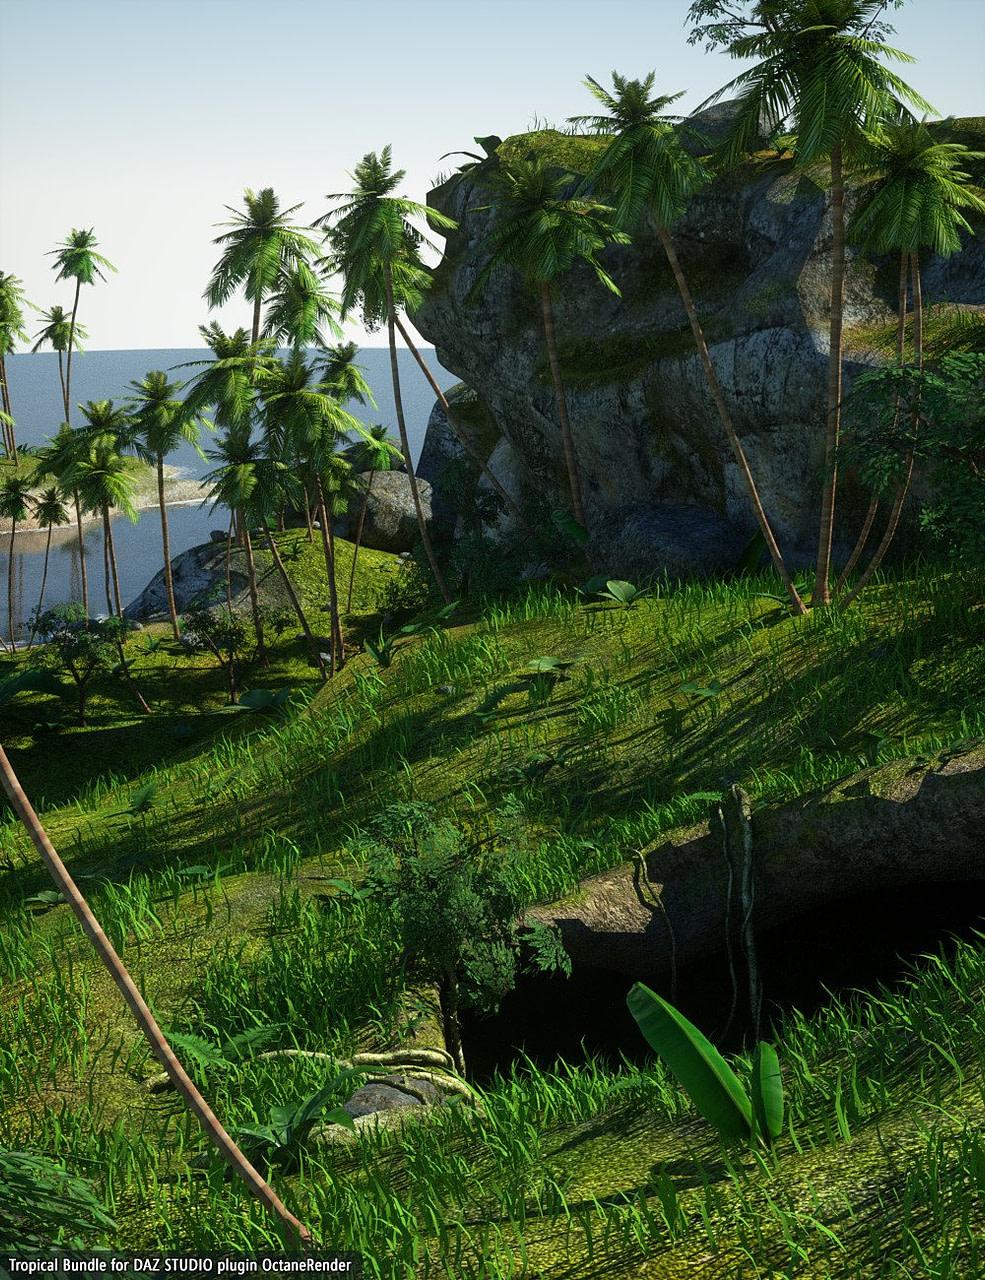 daz studio tropical bundle octanerender